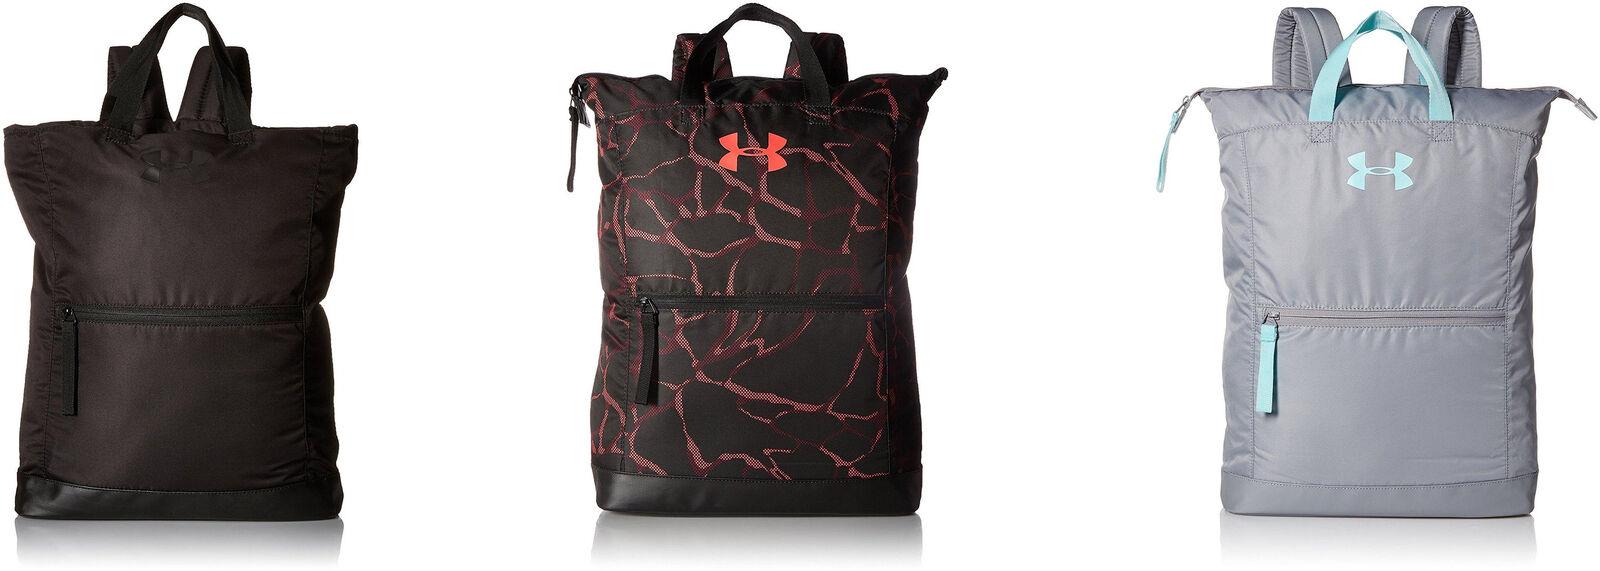 Under Armour Women s Multi-Tasker Backpack, 3 Colors   eBay 3fa34e3c1e